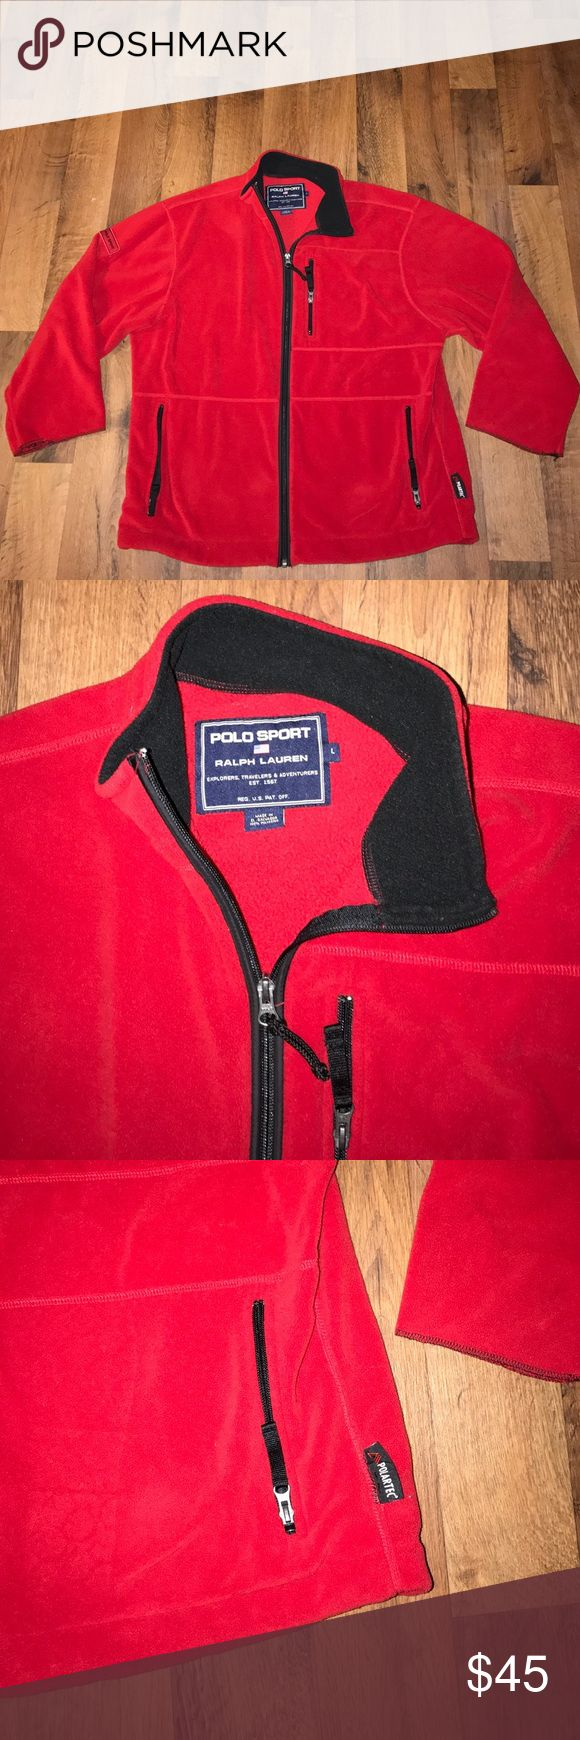 Vintage Large Polo Sport Ralph Lauren Fleece Coat Excellent condition Polo by Ralph Lauren Jackets & Coats